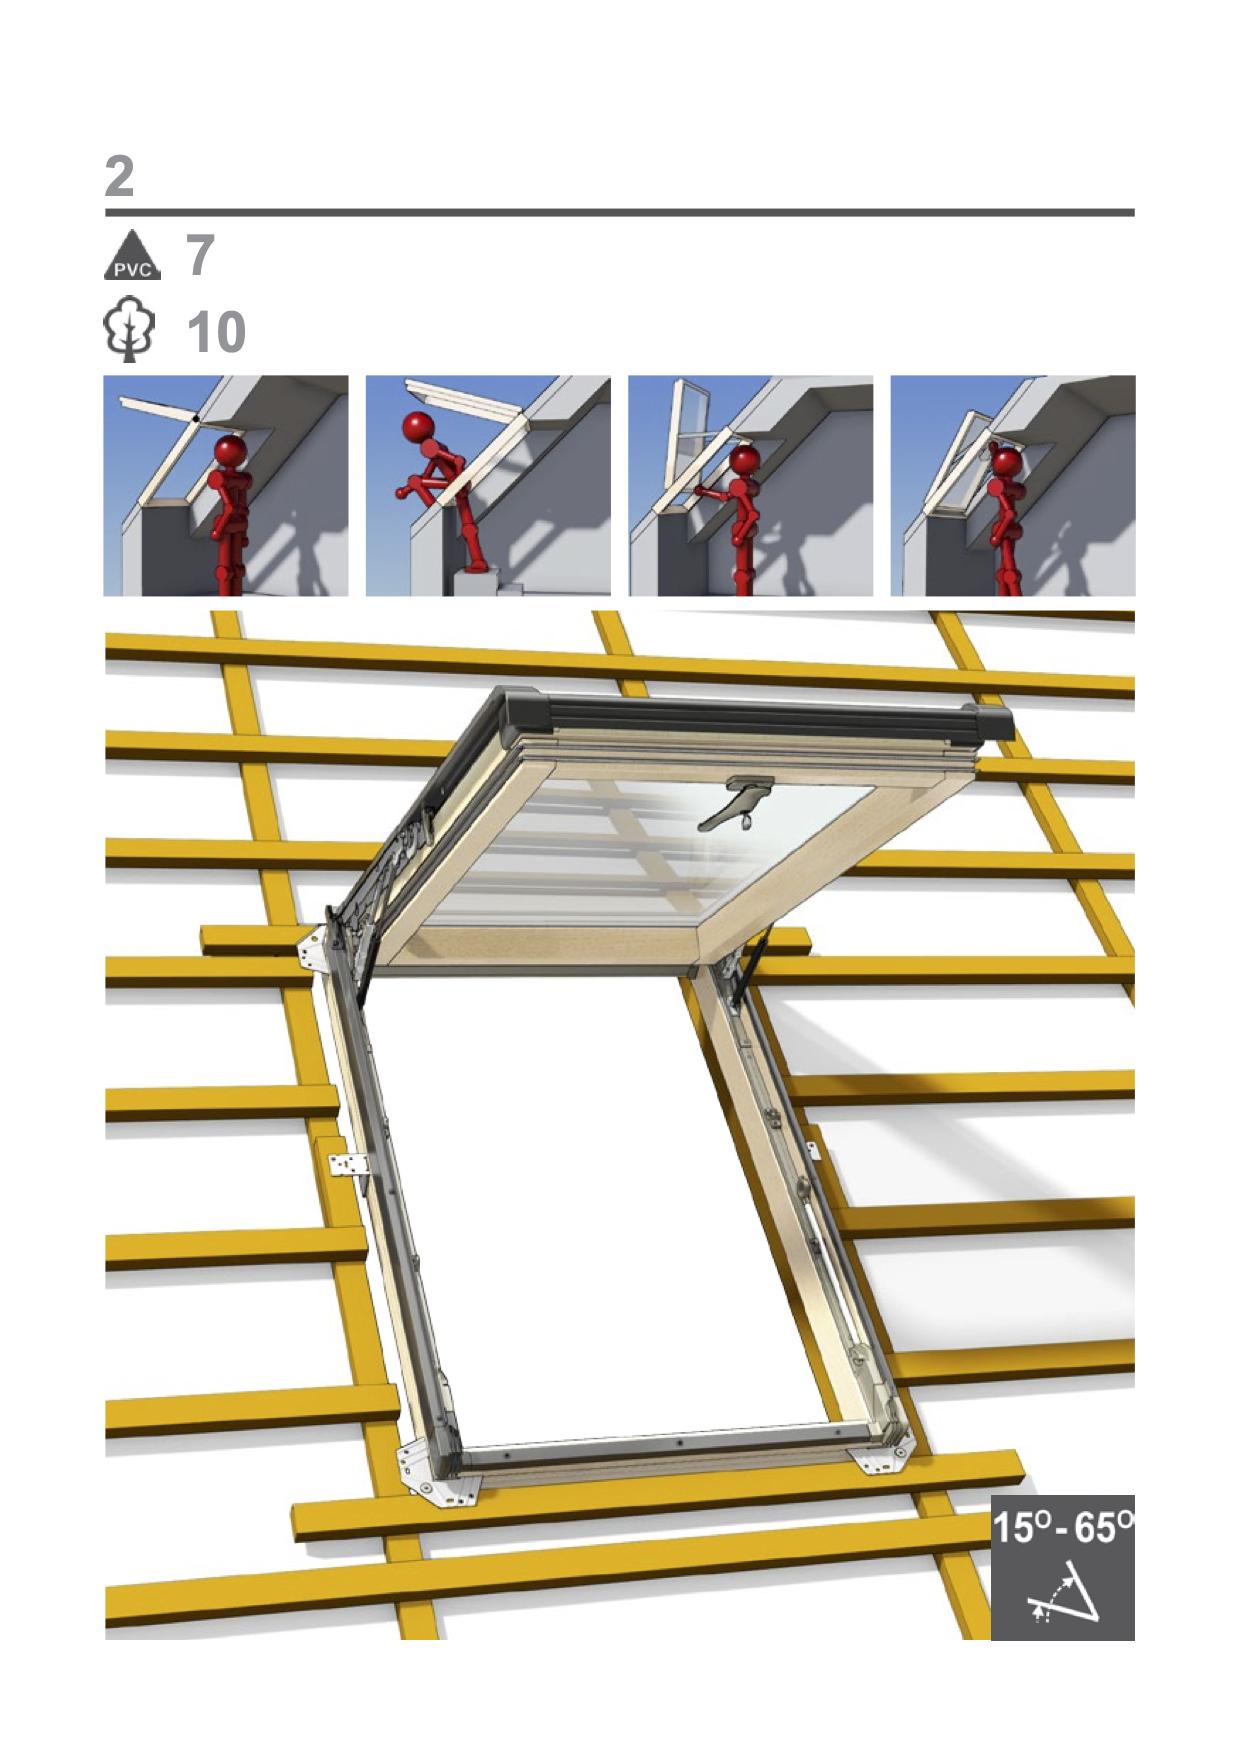 Montage handleiding Intura uitzet dakvensters